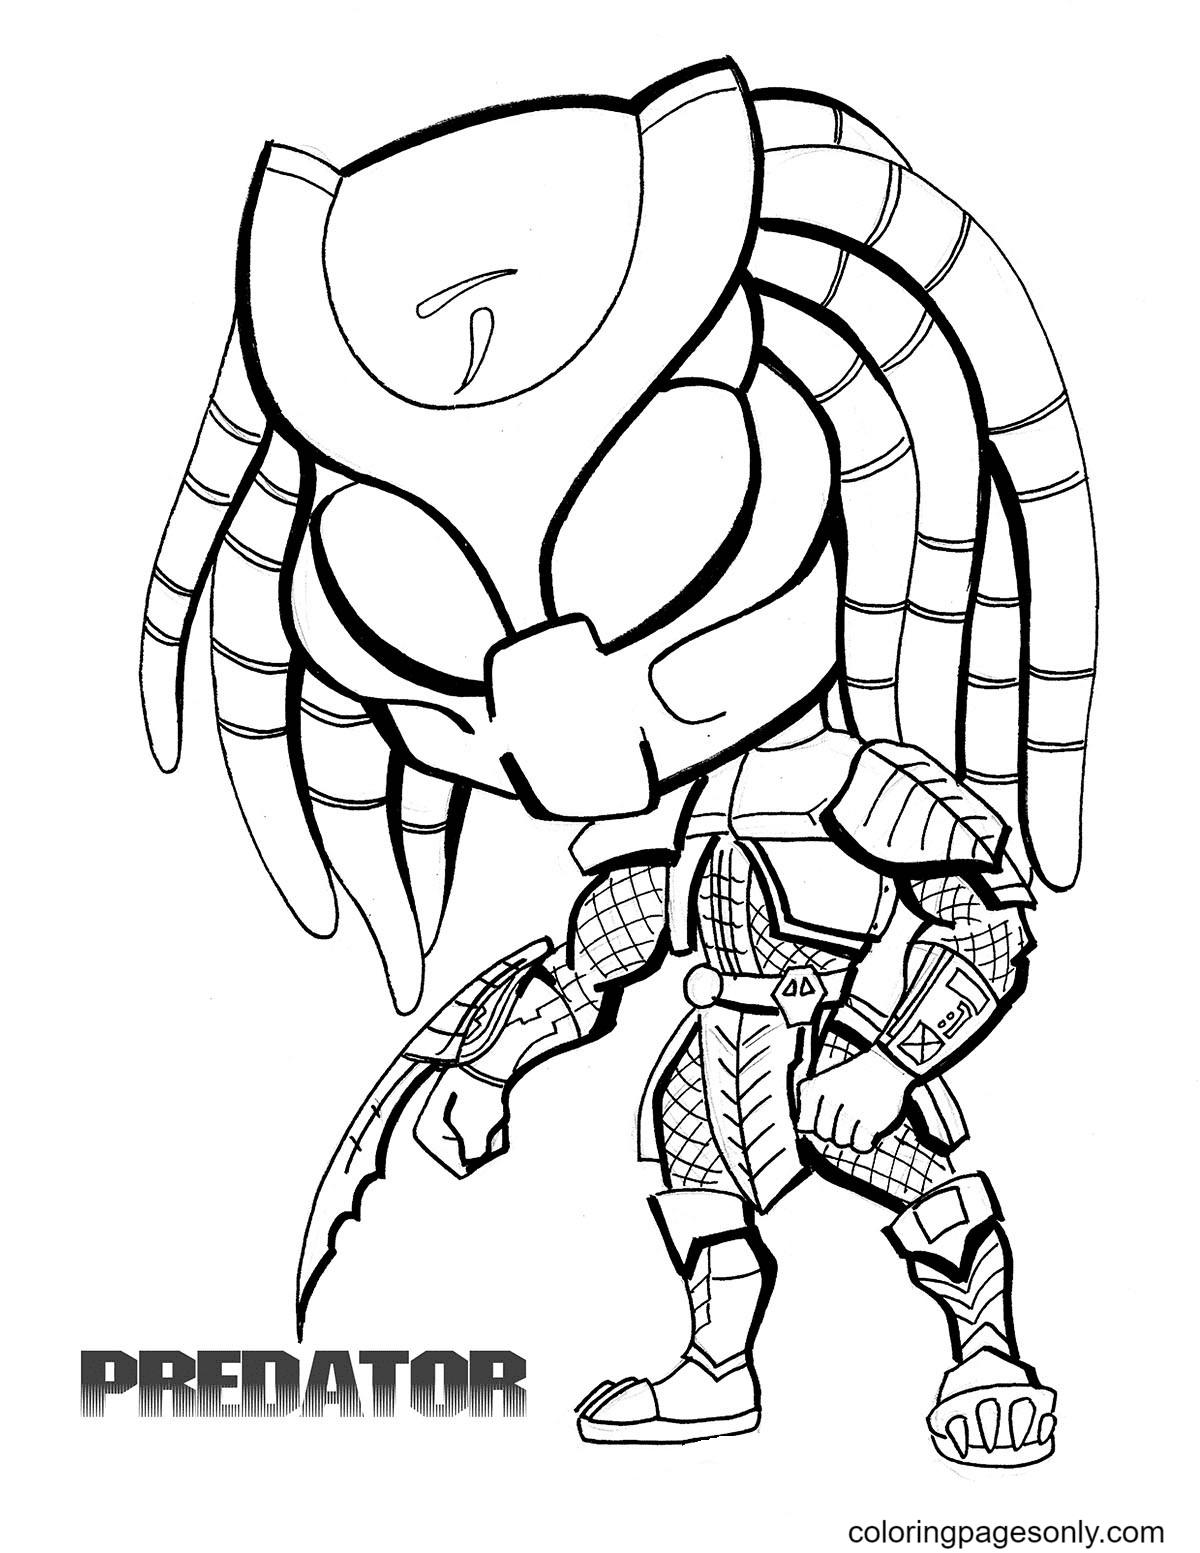 Predator Poster Coloring Page